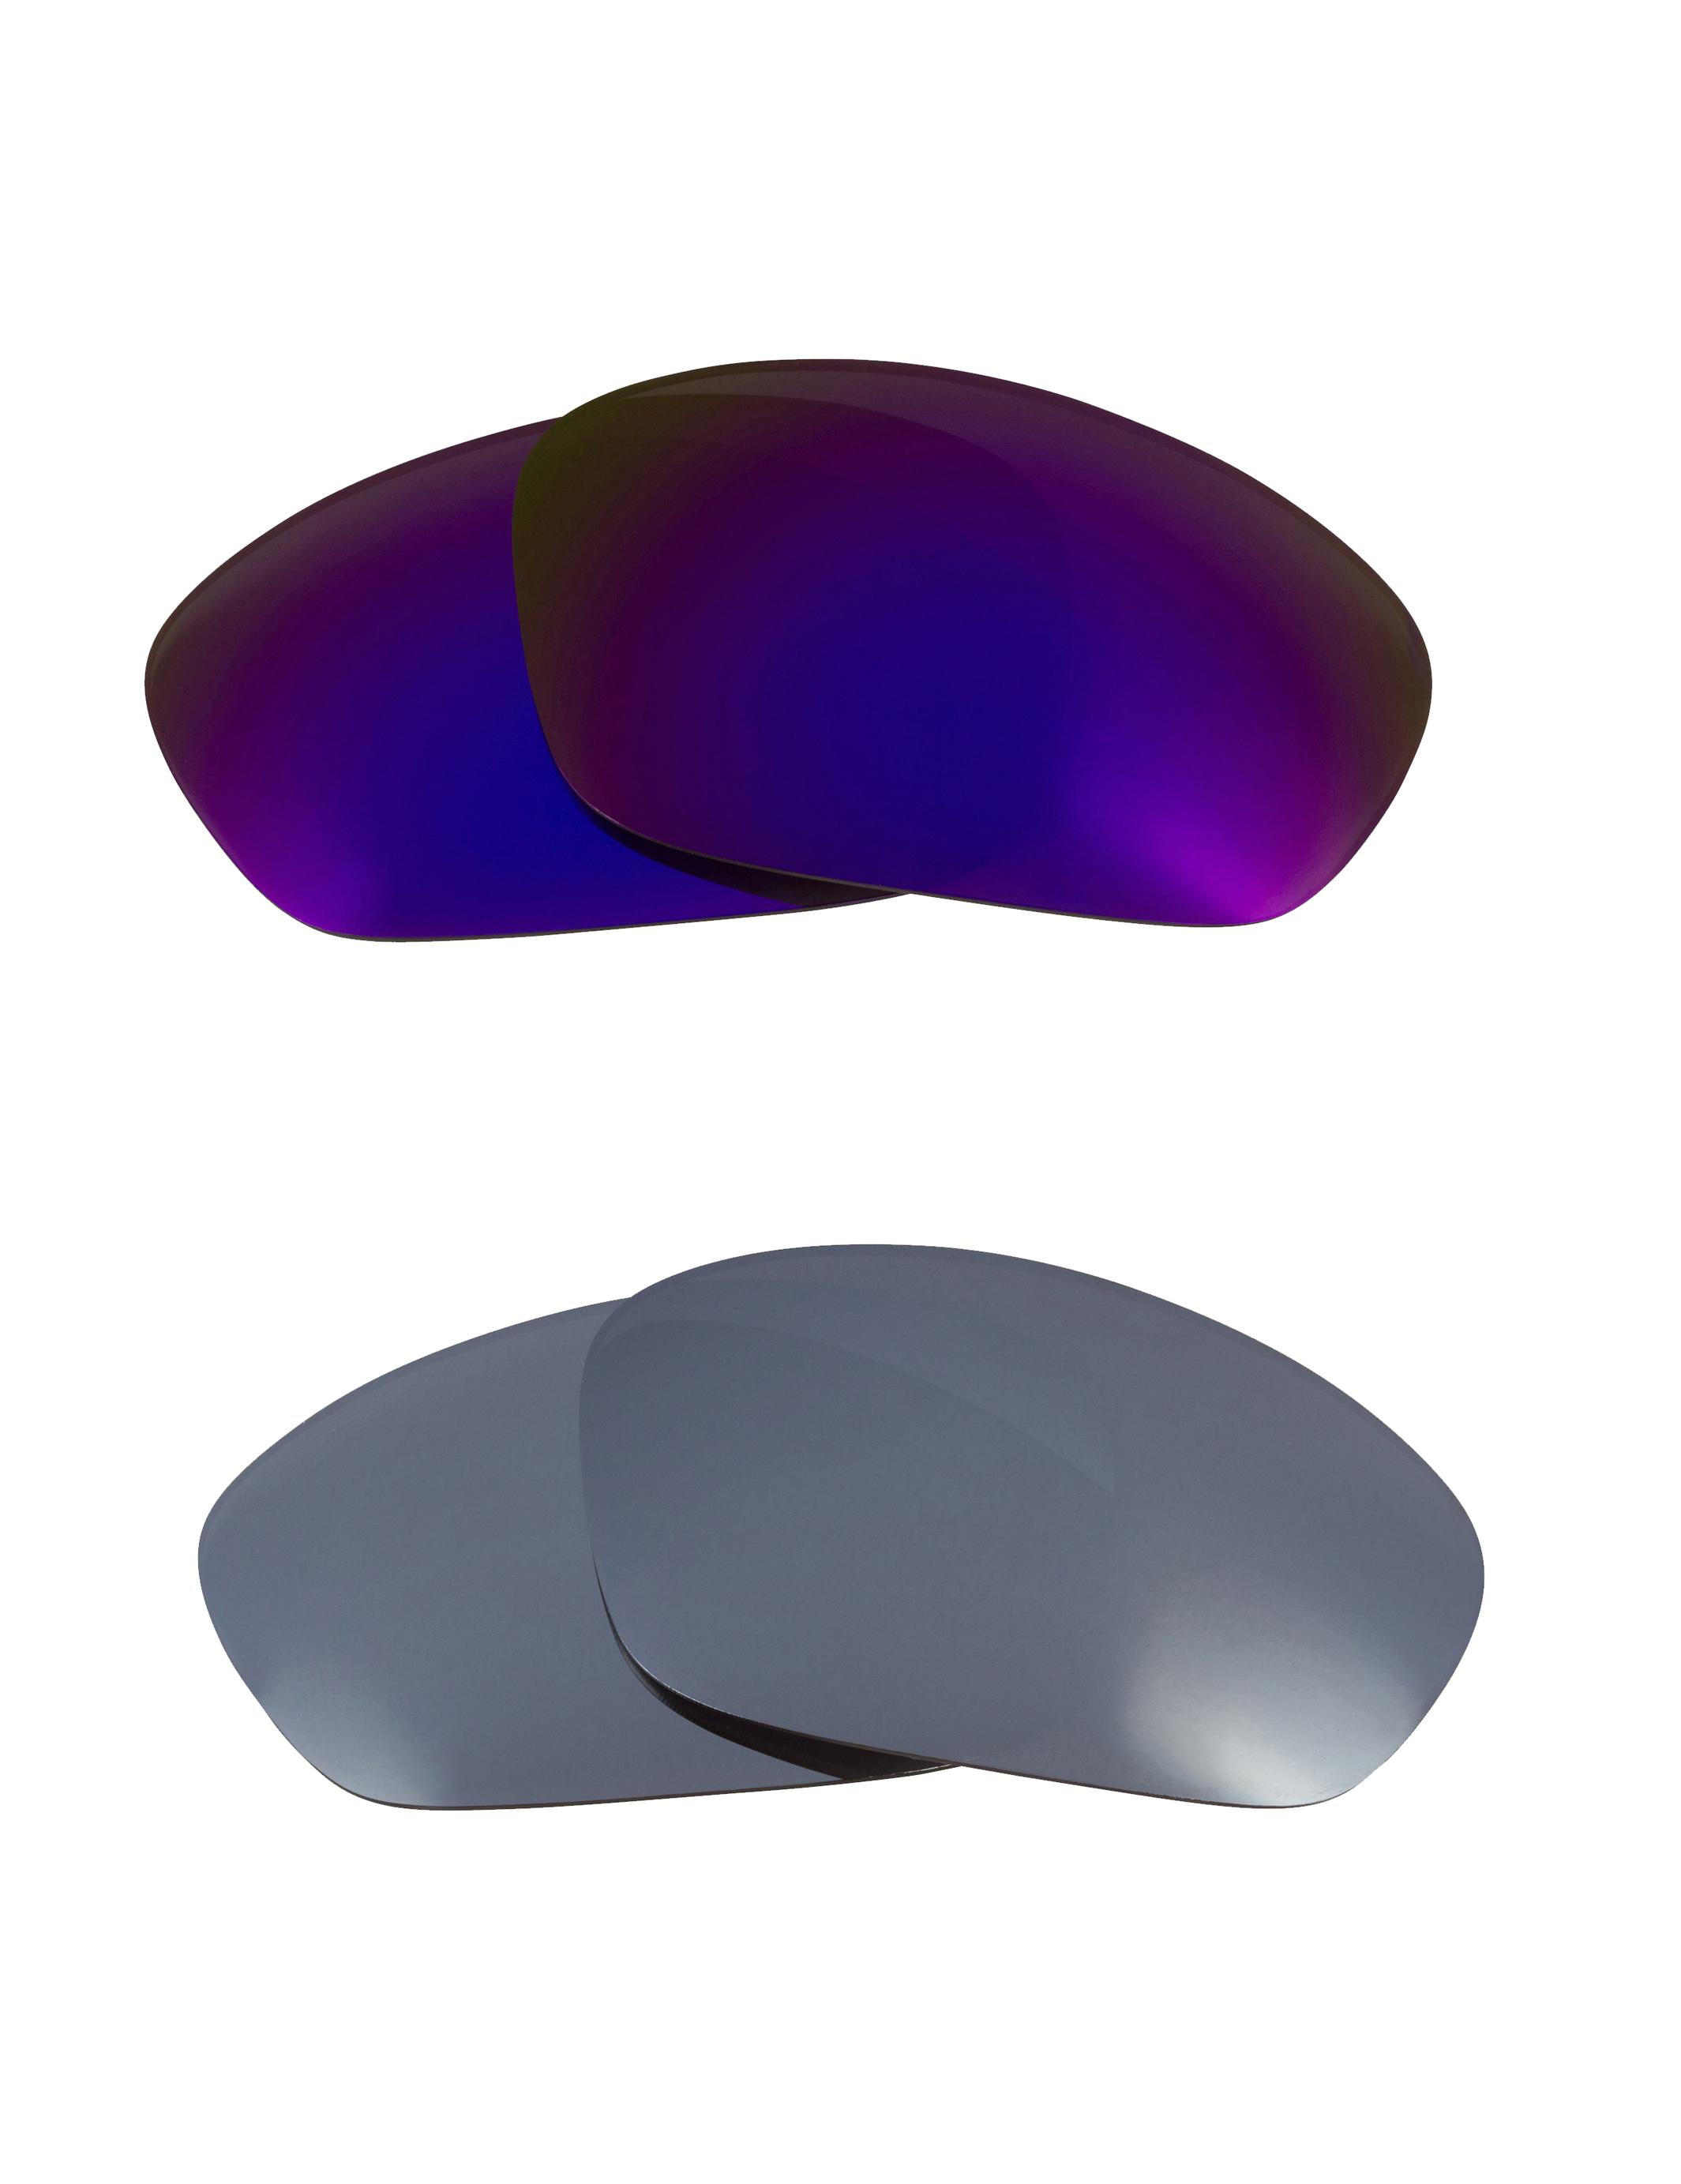 82618e26236 Oakley Monster Pup - Polarized REVO Metallic Silver Mirror   REVO Deep  Purple Mirror - Seek Optics